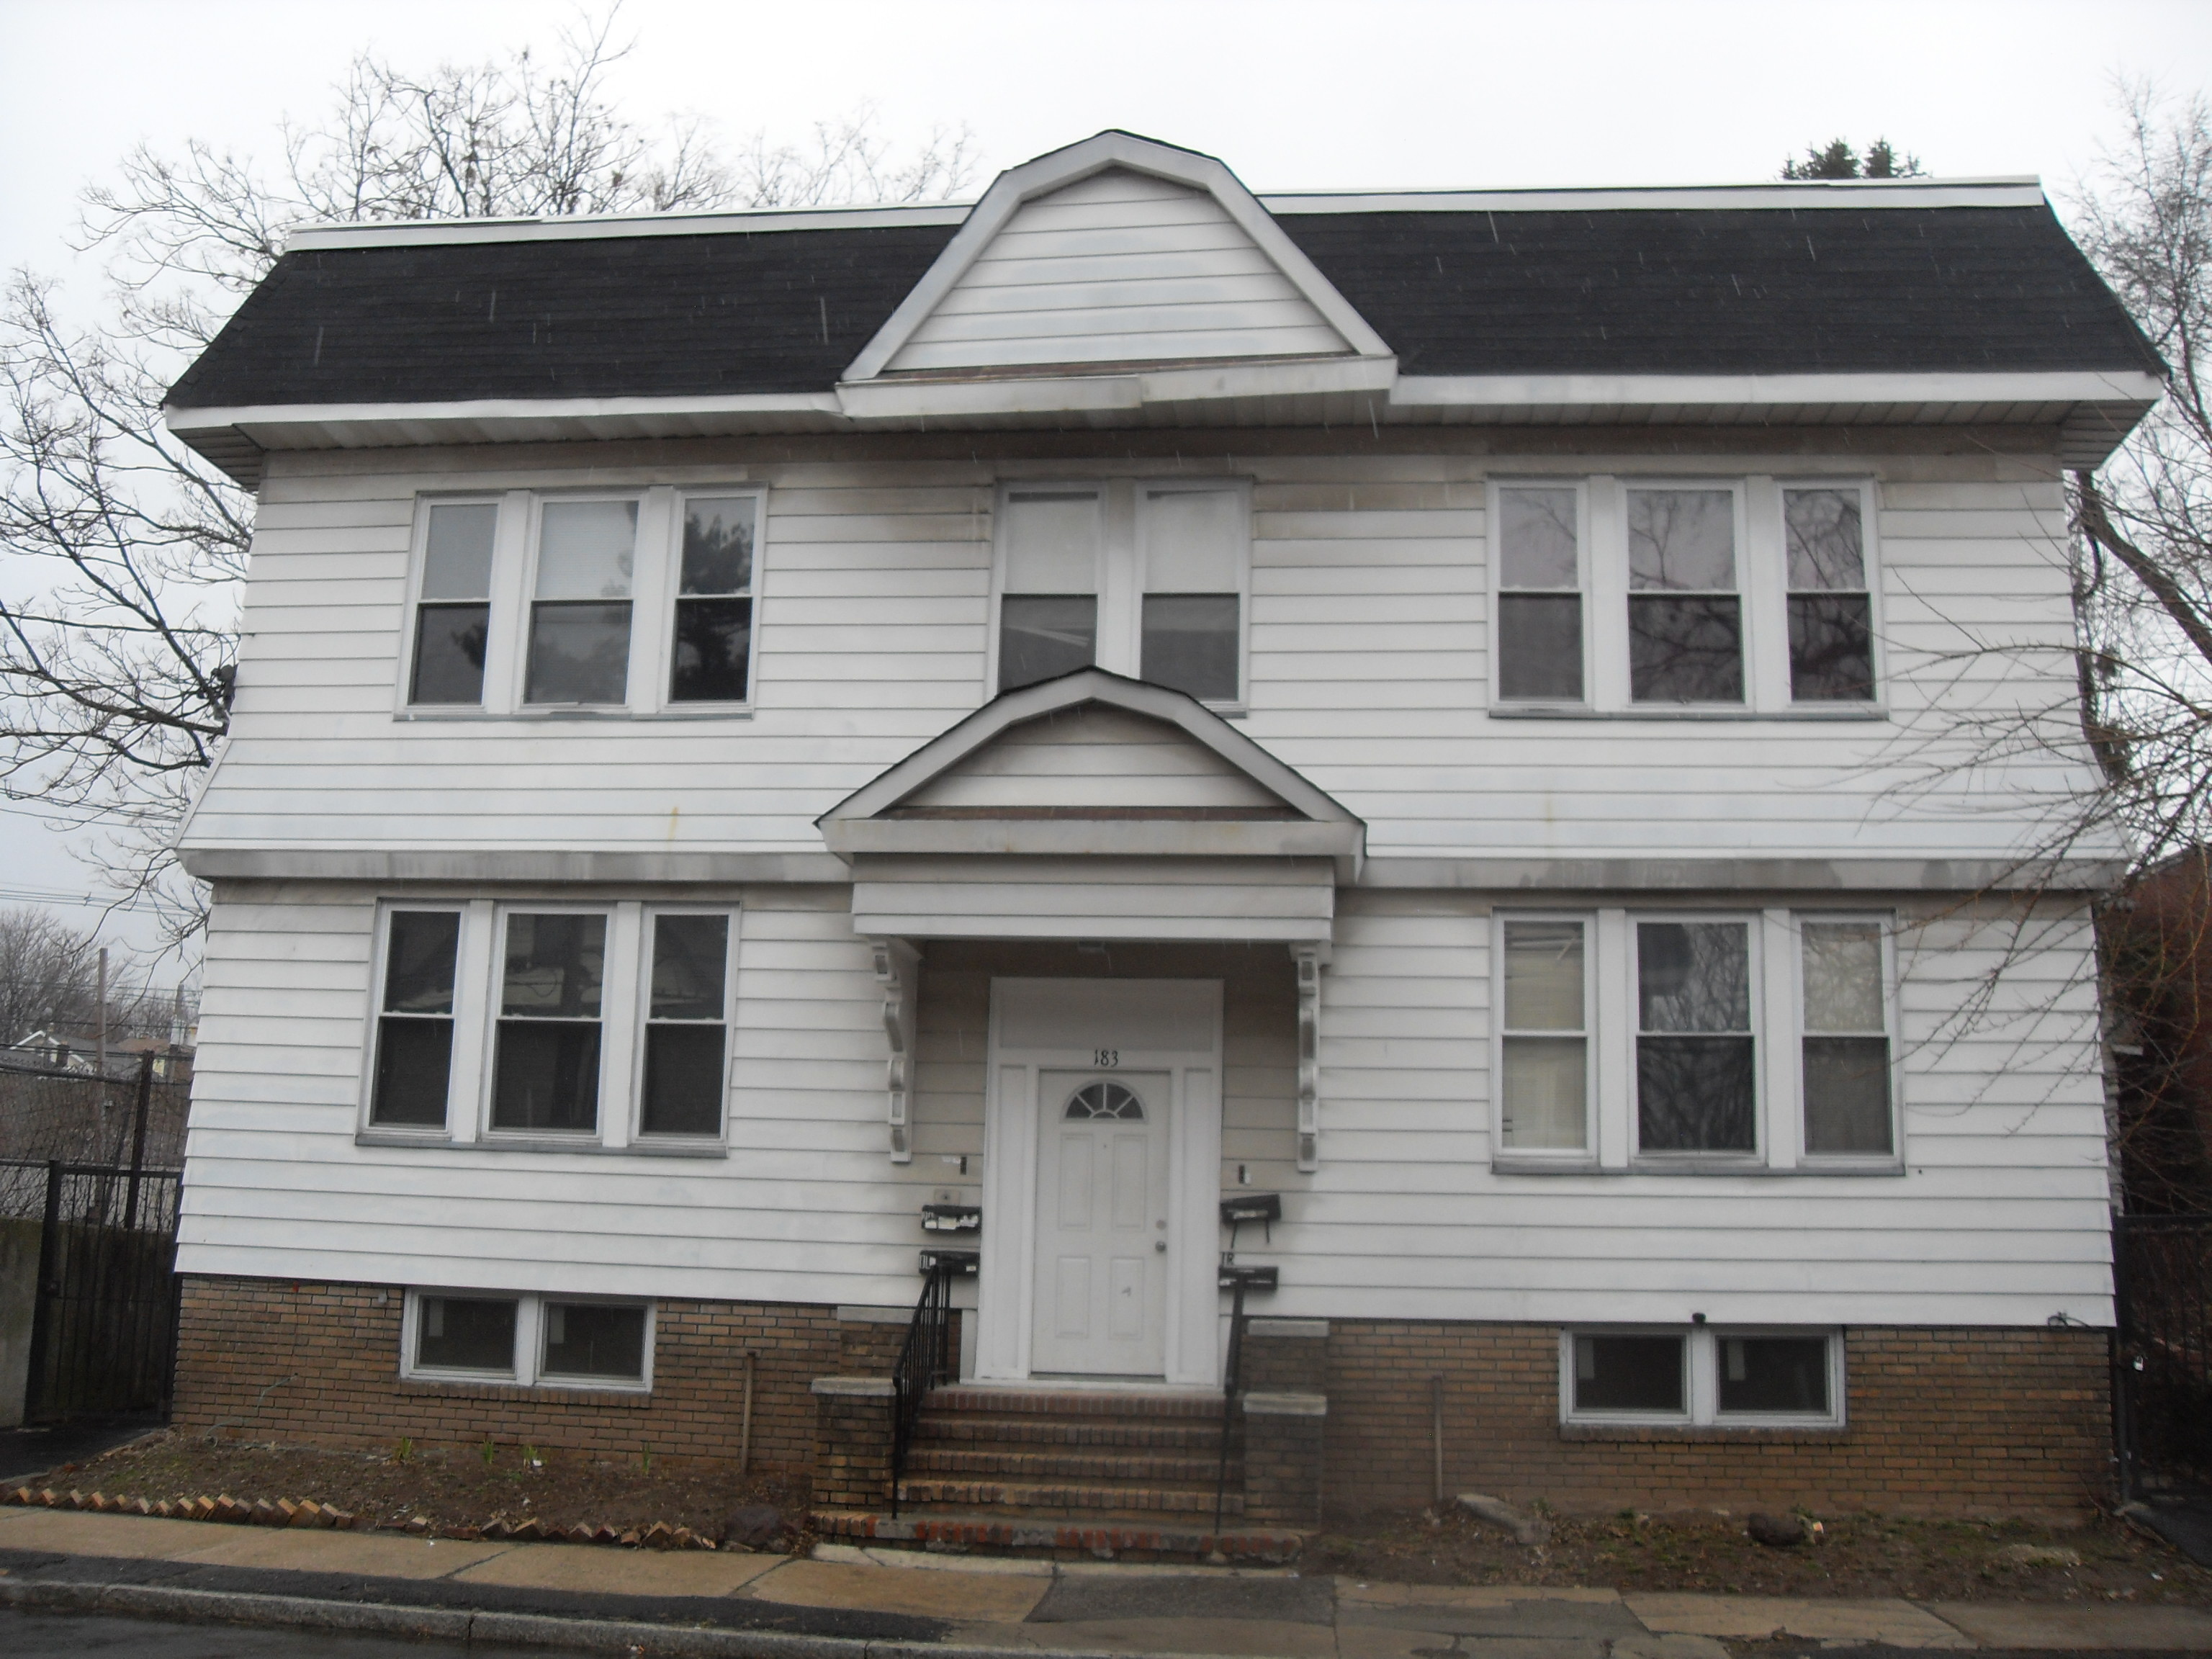 183-185 NORWOOD ST, Newark, New Jersey 07106